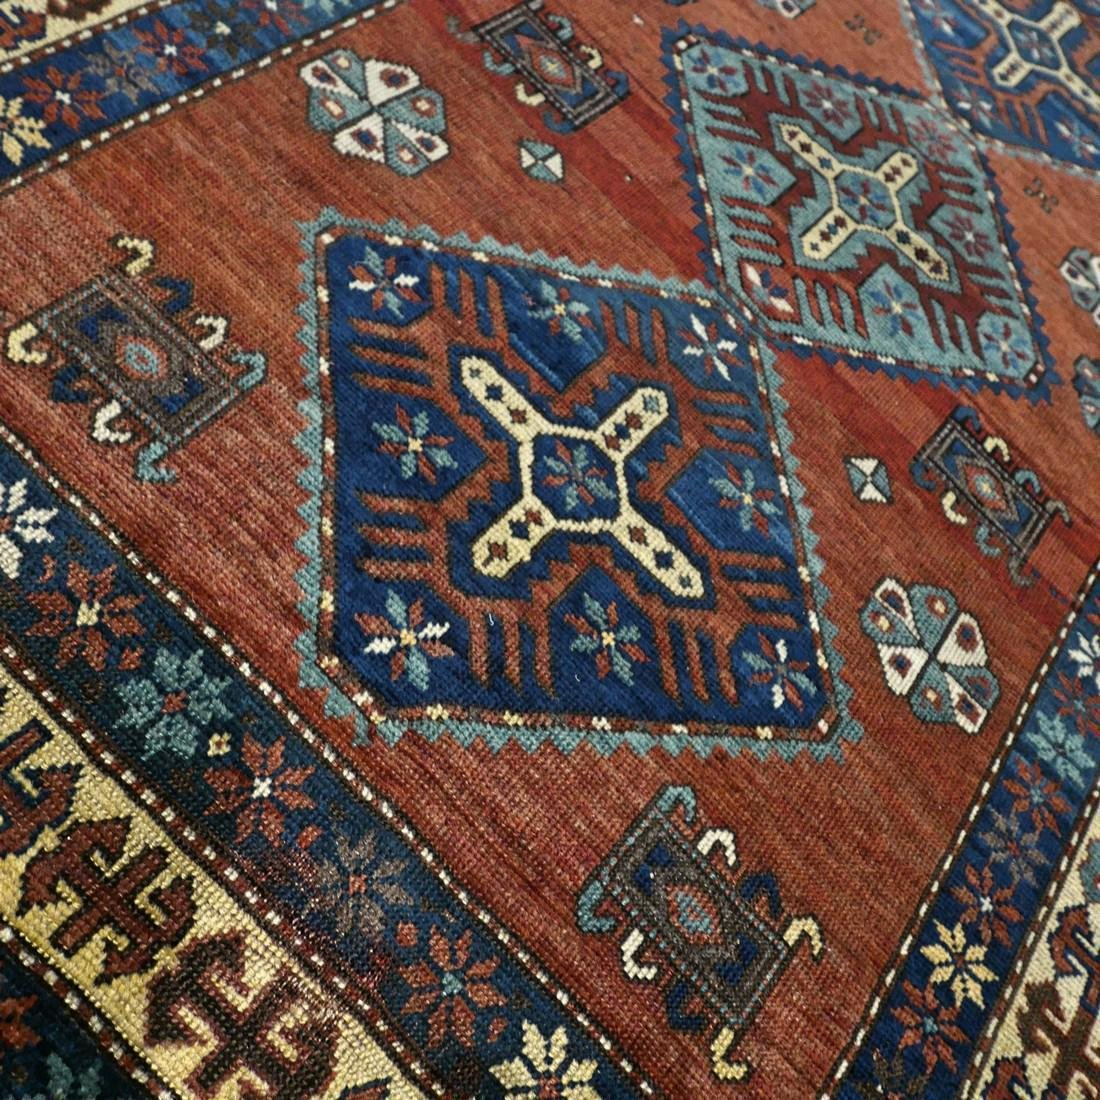 Wonderful antique 1940s Kazak rug6.1 x 4.4 - 4